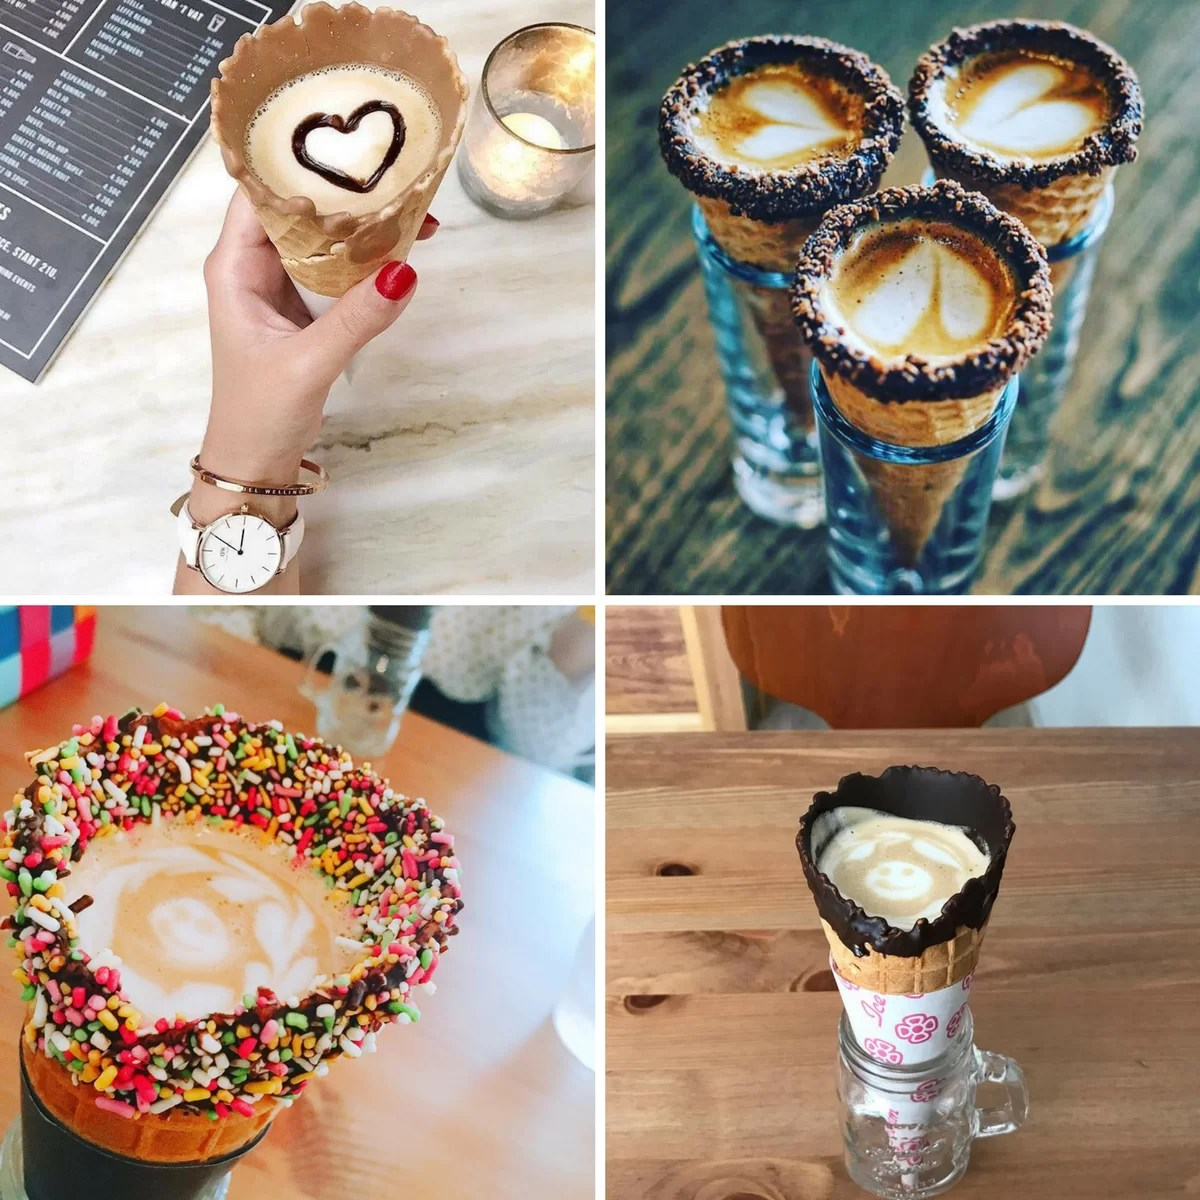 coffee cone tendenza caffè 2017